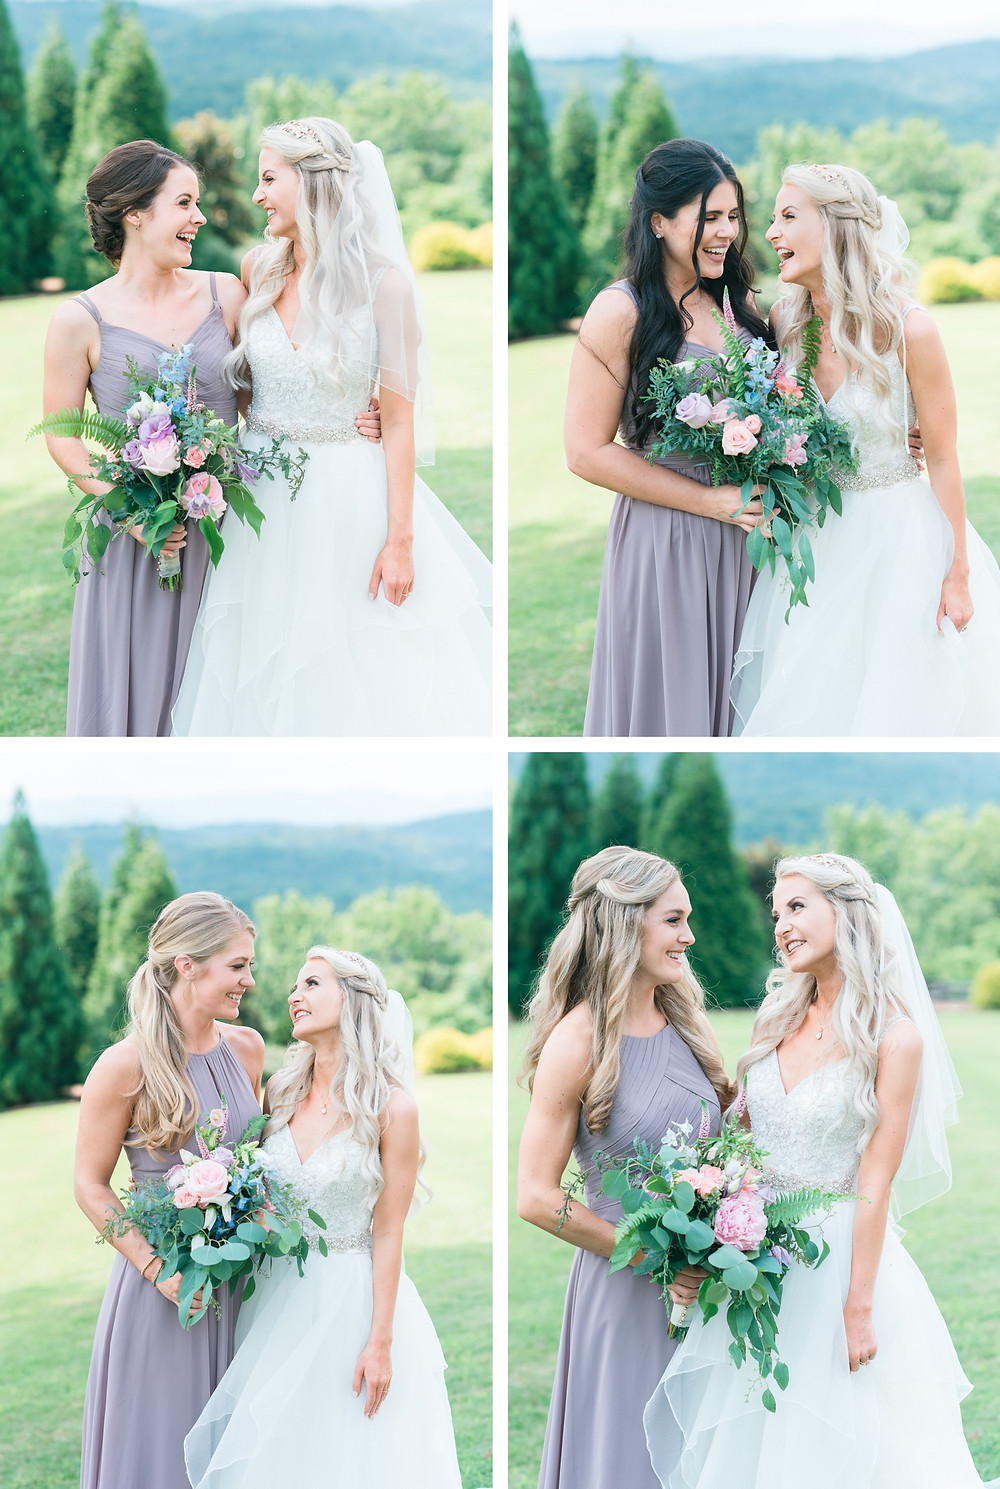 blue-mountain-vineyard-wedding-venue-outdoor-wedding-ceremony-lavender-wedding-color-palette